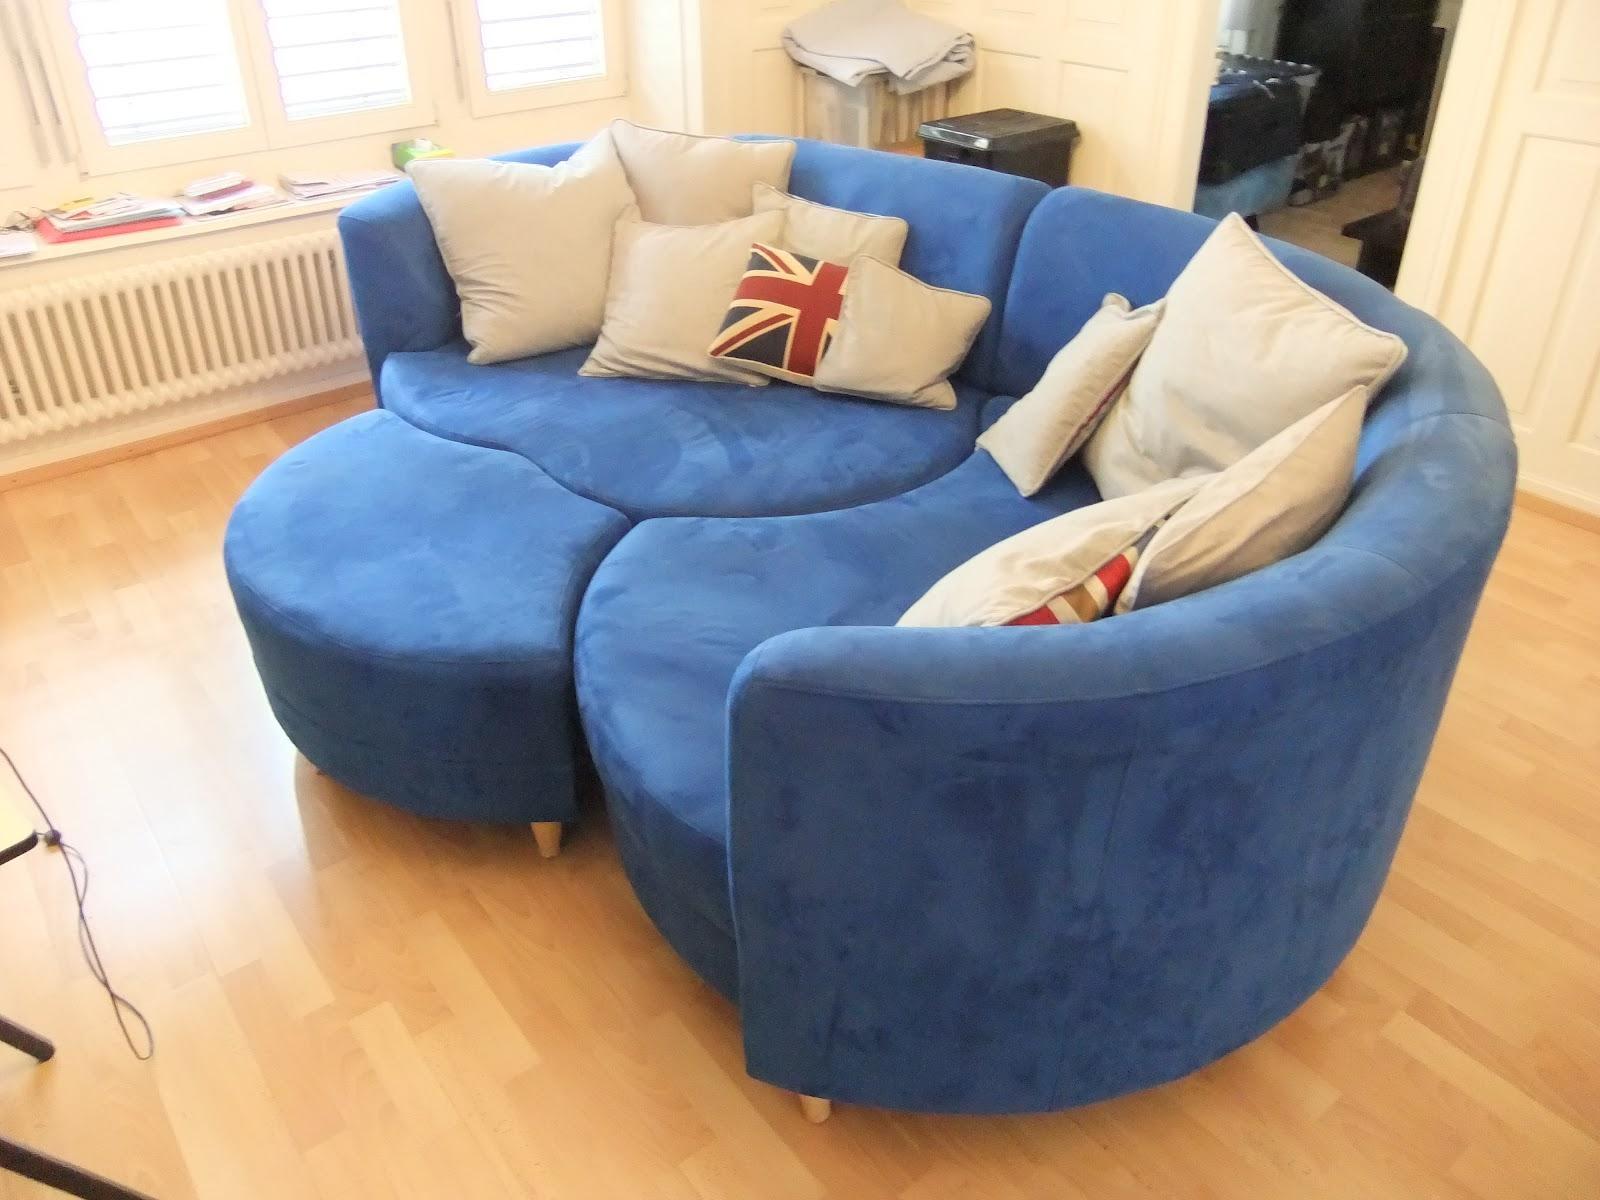 Round Sofa Chair Pinterest | Tehranmix Decoration Regarding Round Sofa Chairs (View 15 of 20)